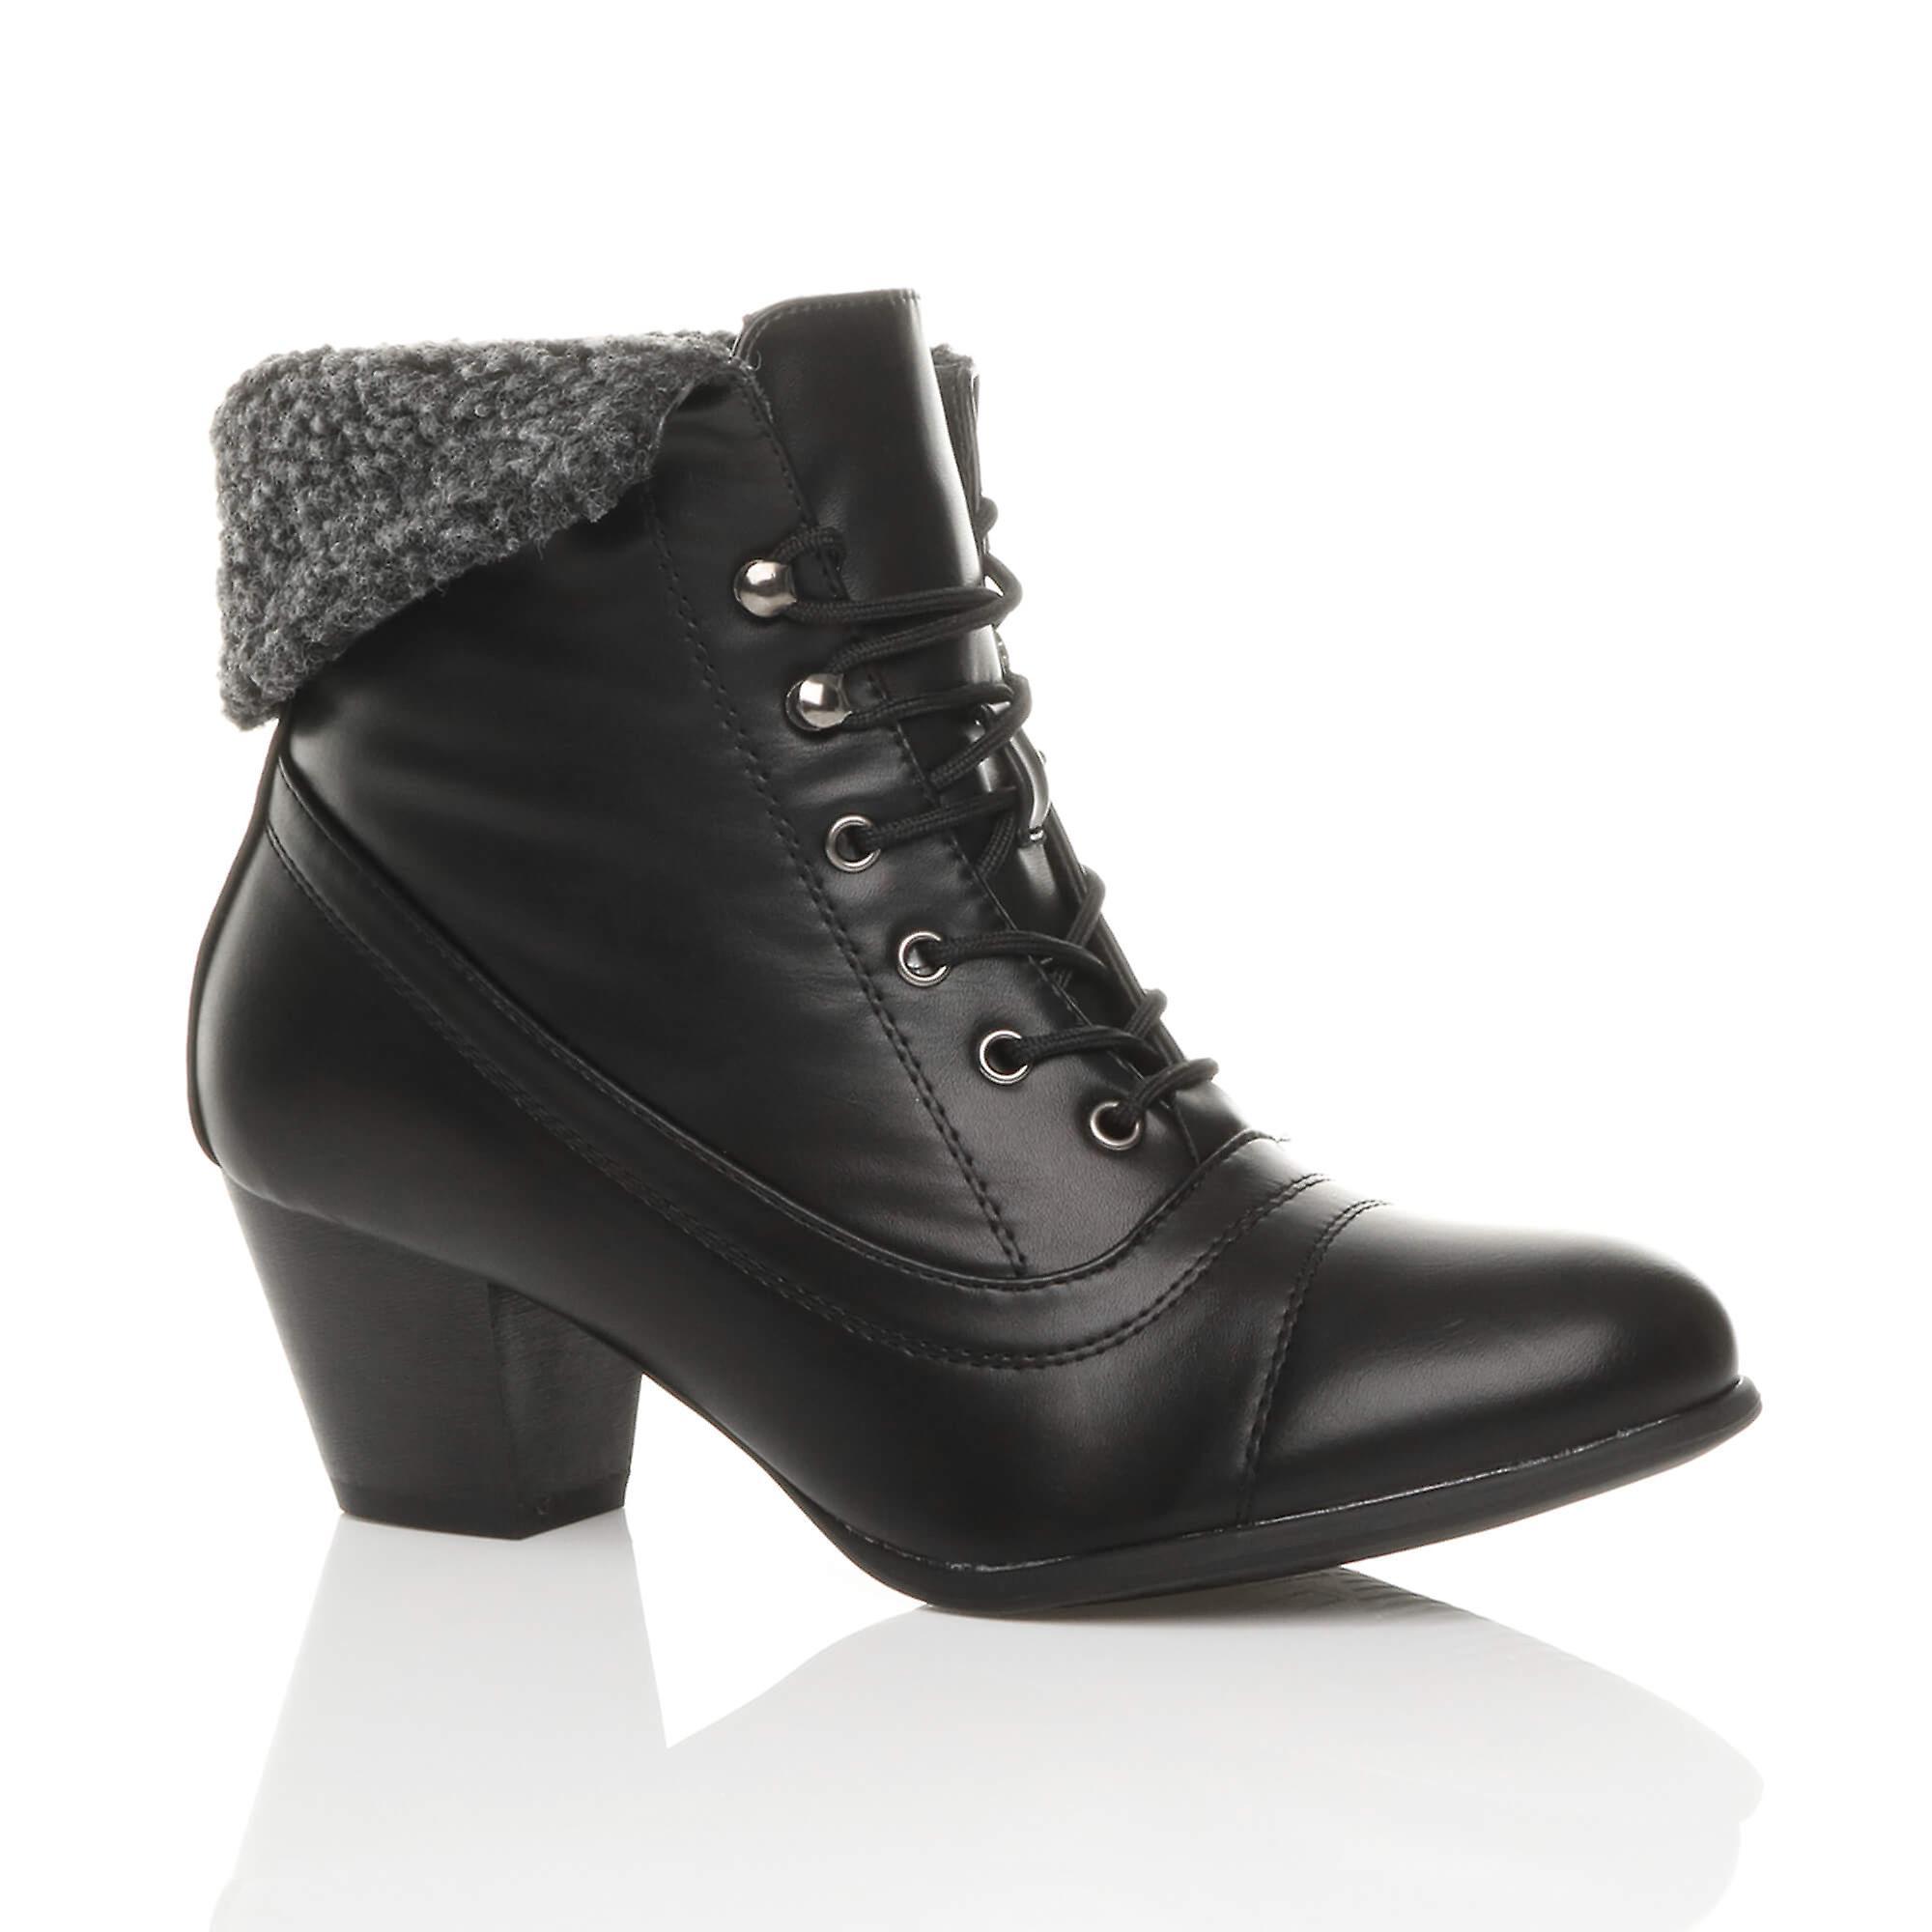 Ajvani womens mid heel lace up vintage fur cuff winter pixie ankle boots fT85U